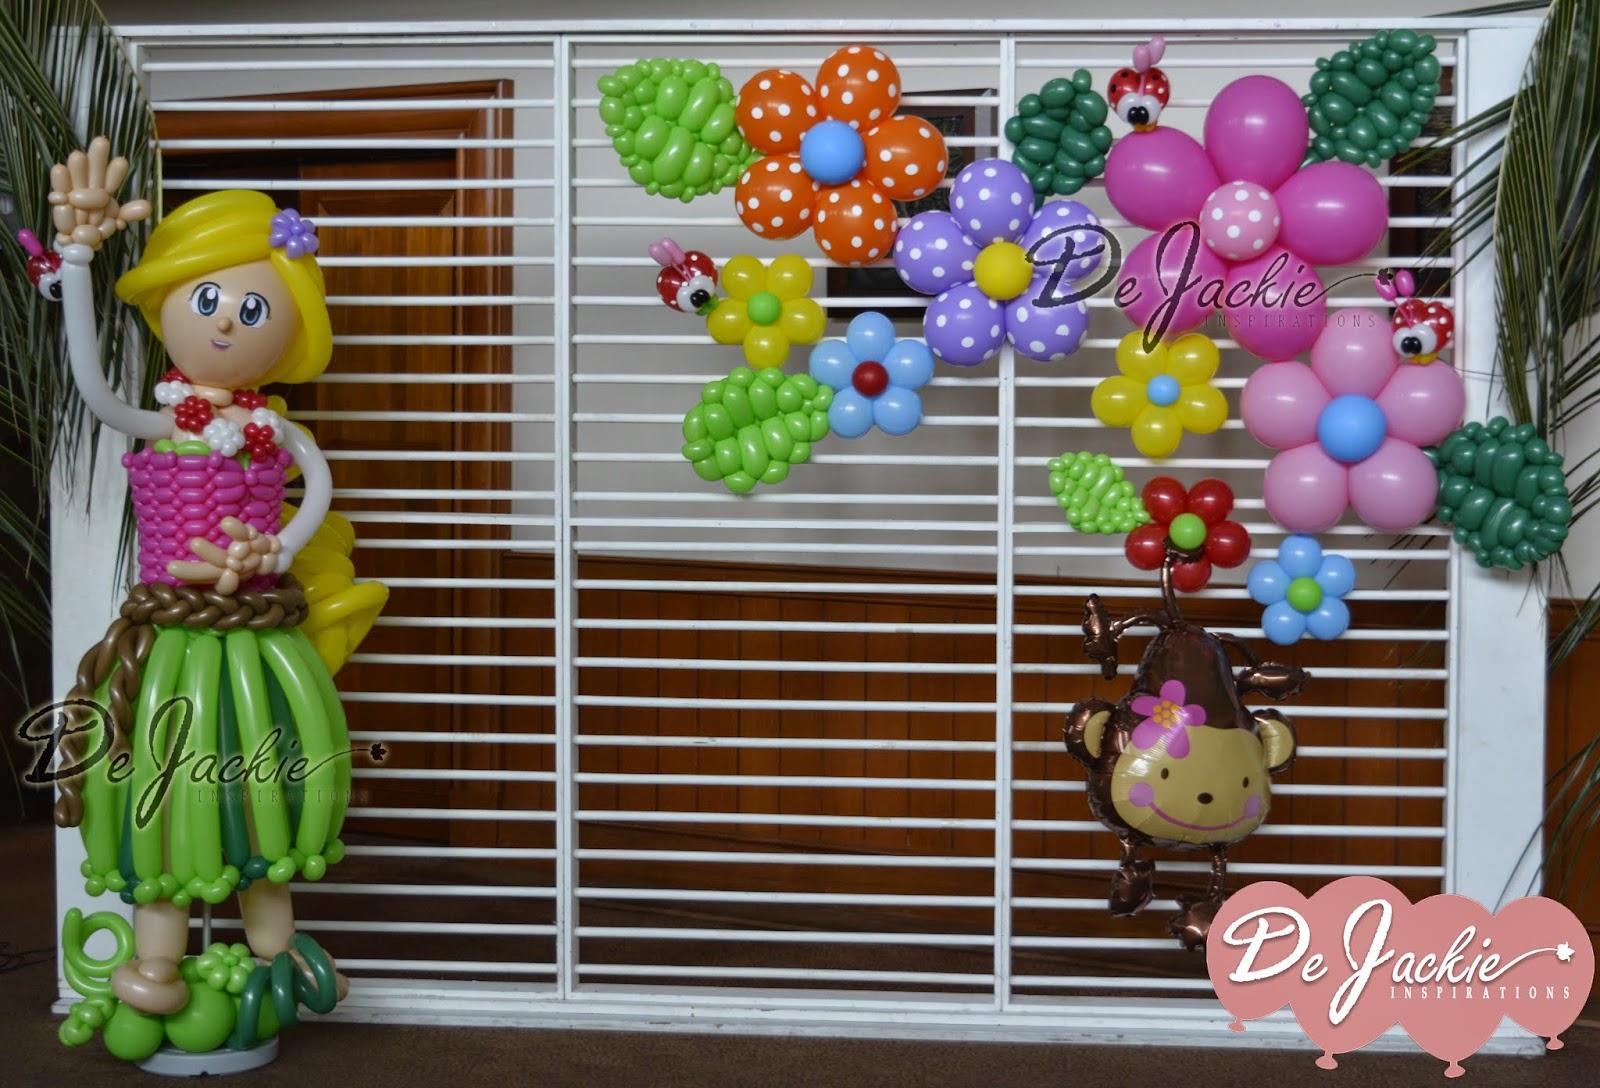 Balloon Decorations For Weddings Birthday Parties Balloon